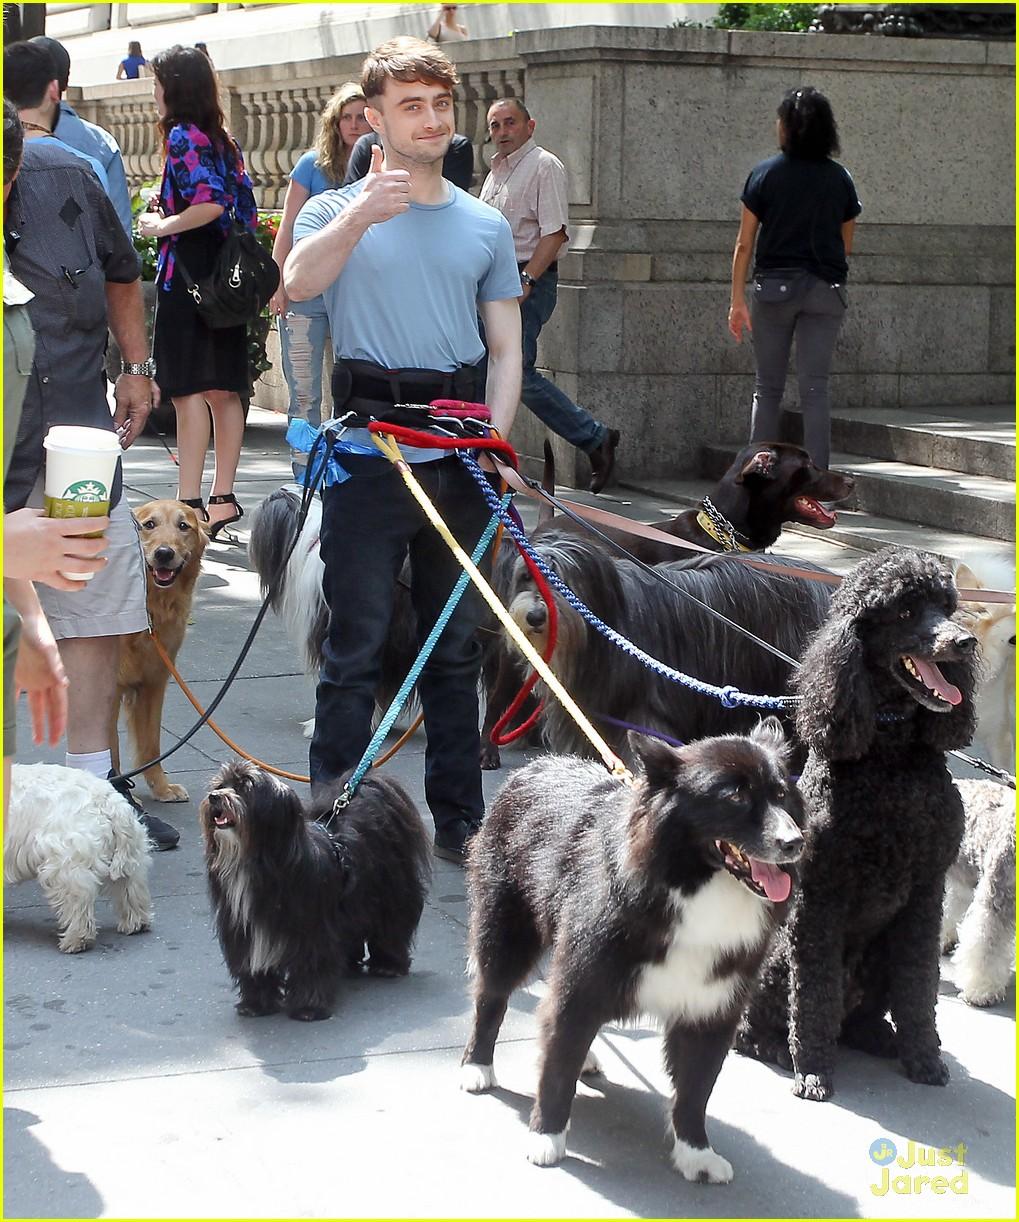 daniel radcliffe dog walker trainwreck nyc set 07 full sized photo of daniel radcliffe dog walker trainwreck nyc set